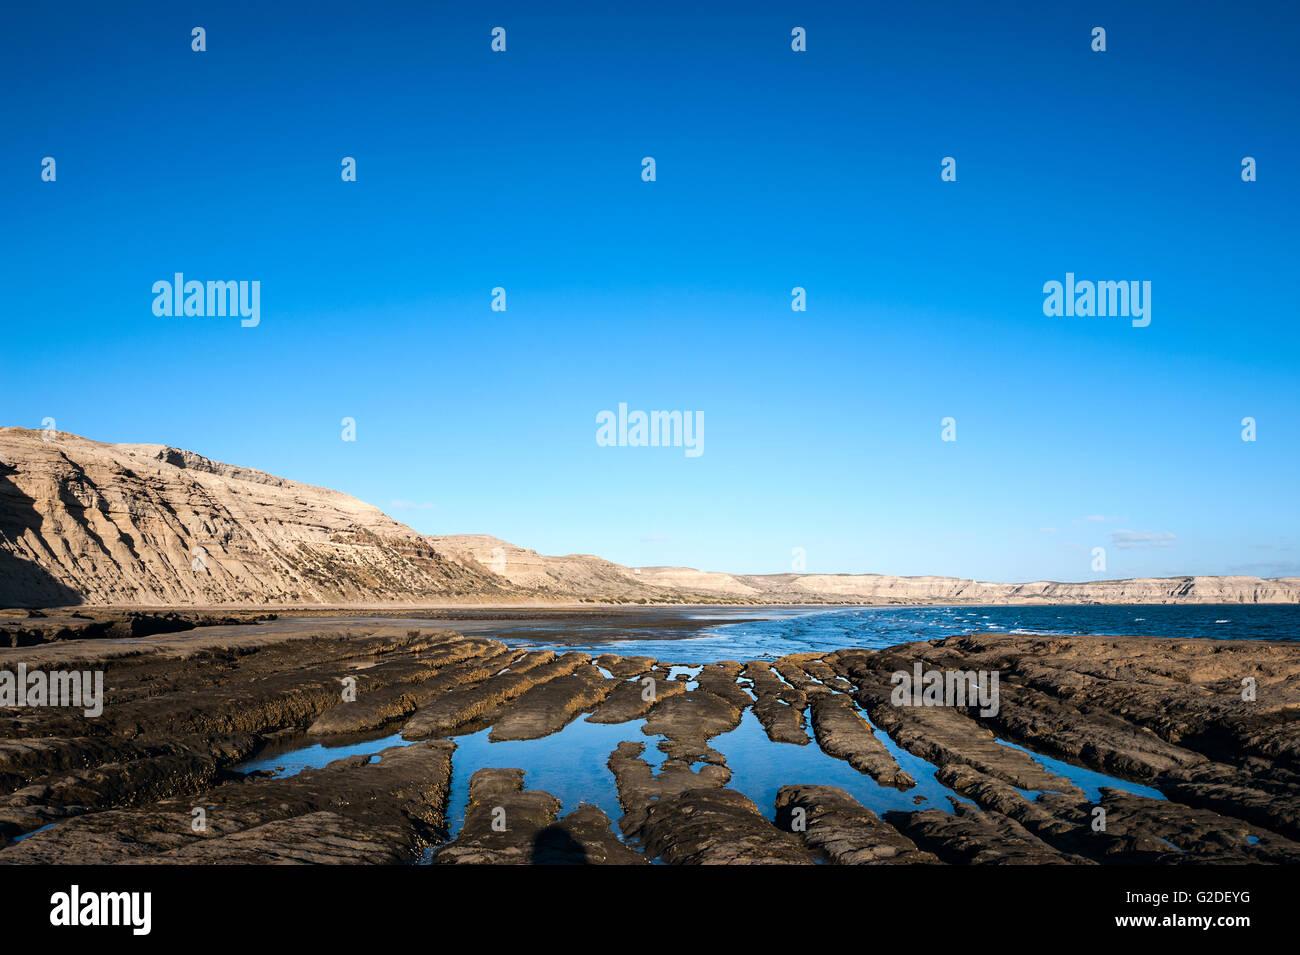 Patagonia Coastline, Peninsula Valdes, Argentina - Stock Image